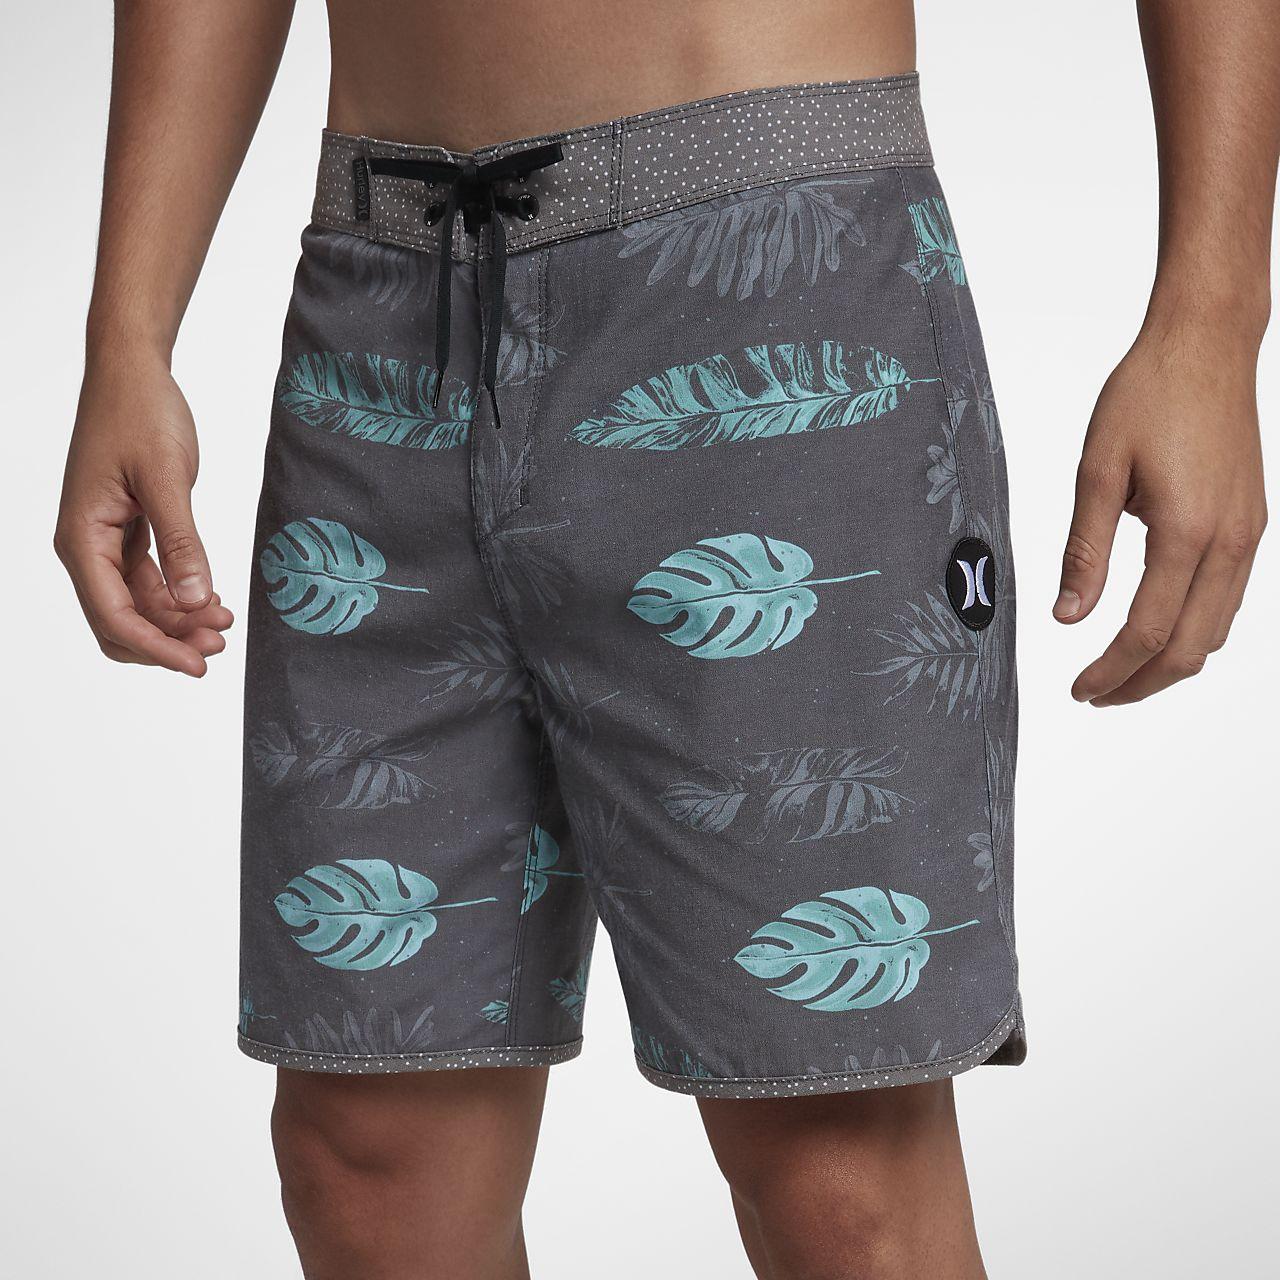 Boardshorty męskie Hurley Cabana Men's 46 cm